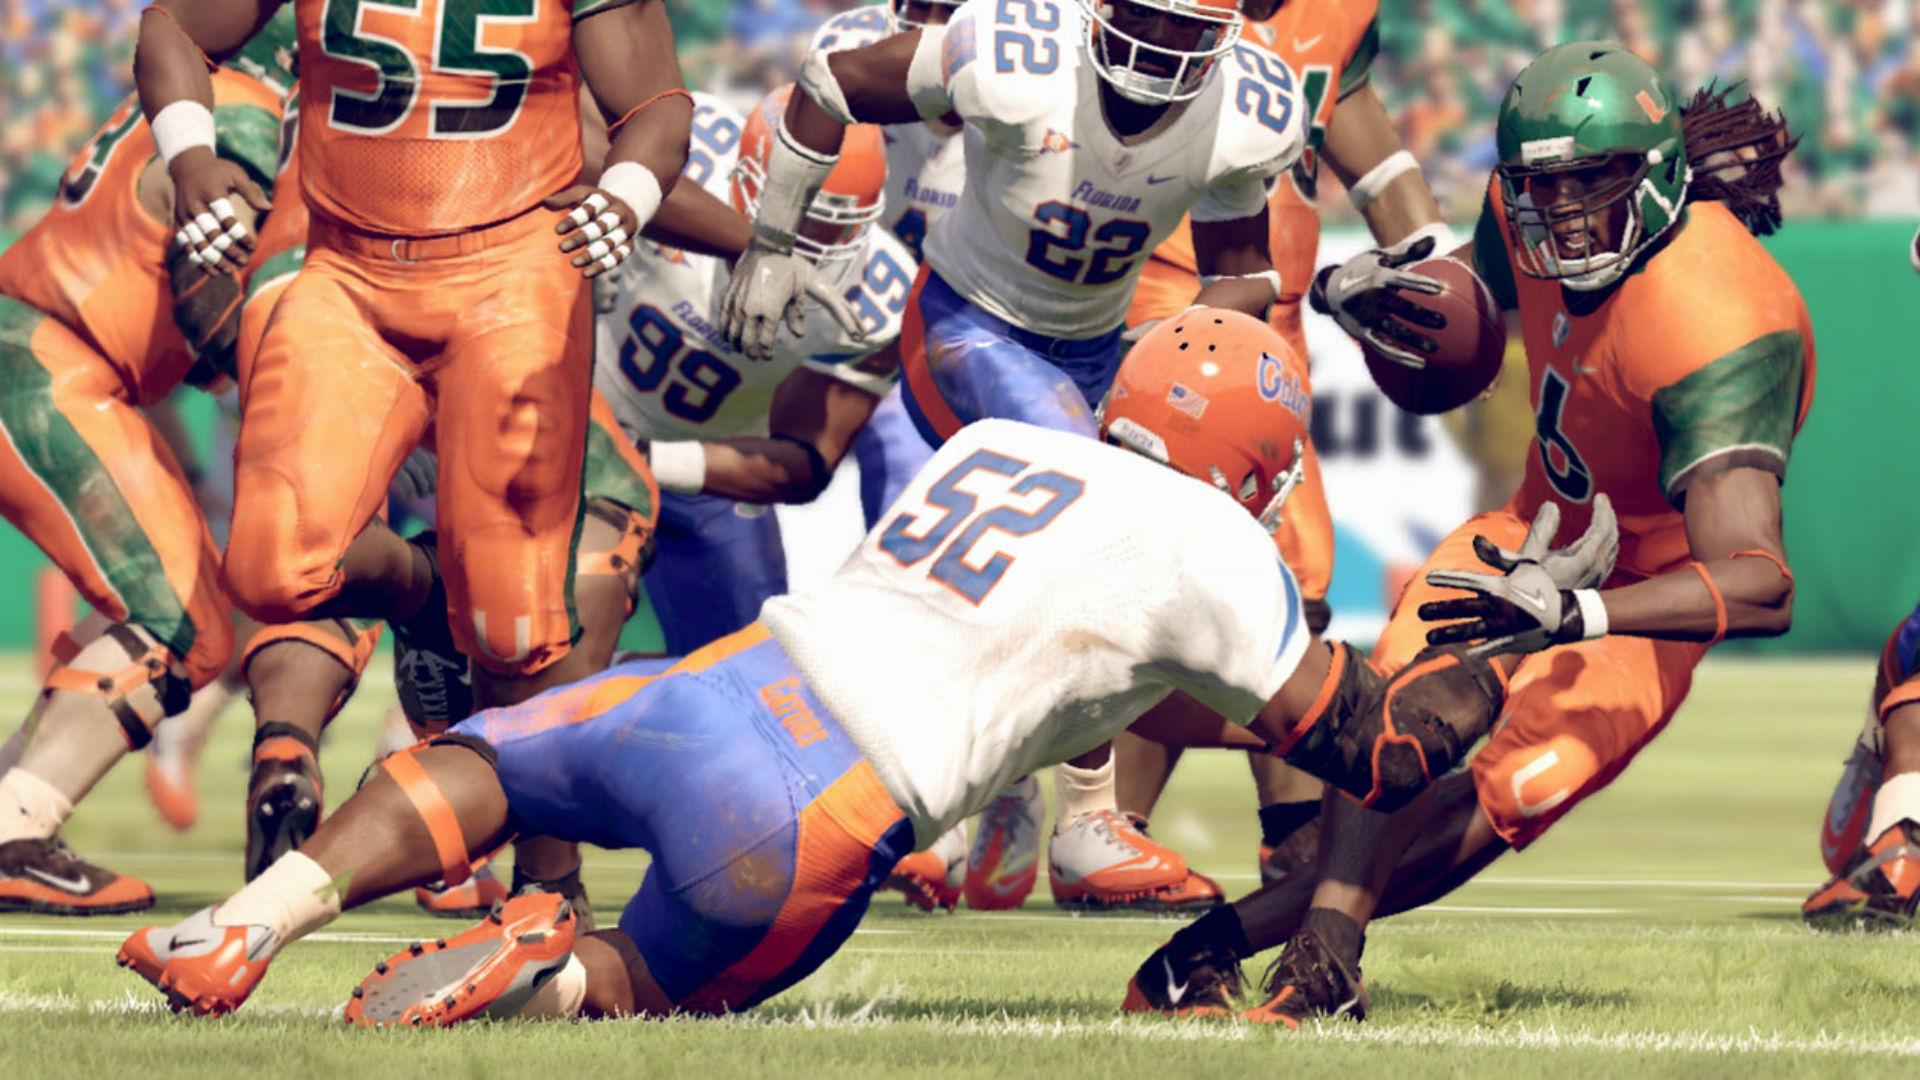 NCAA-football-2014-071117-EA-Sports-FTR.jpg